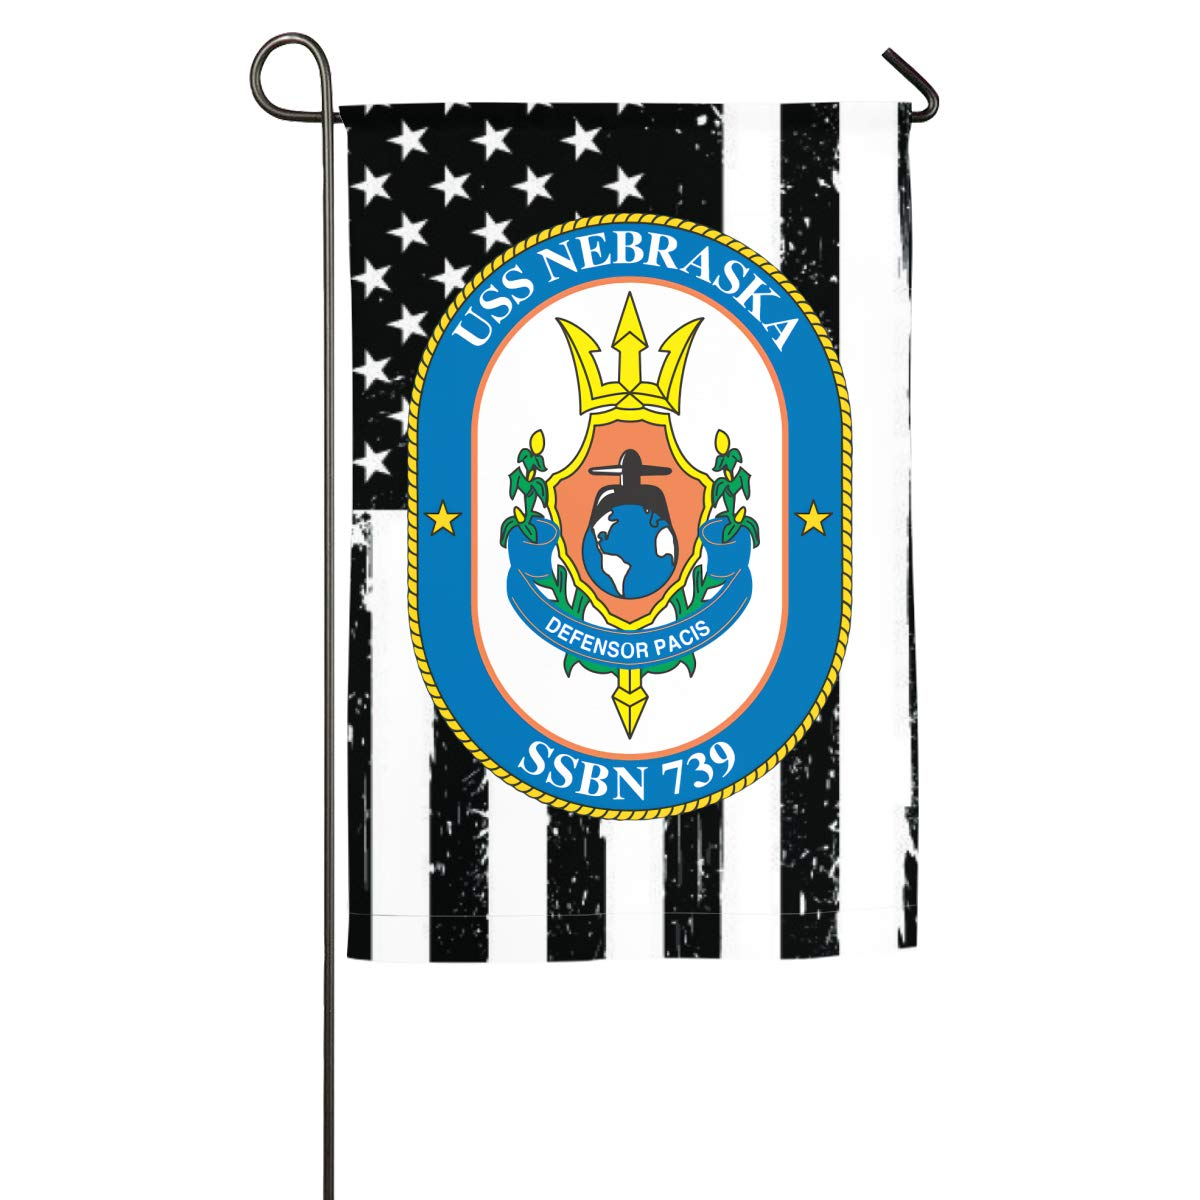 Navy USS Nebraska SSBN-739 Yard Flag Patio Garden Flags Outdoor Banner 18